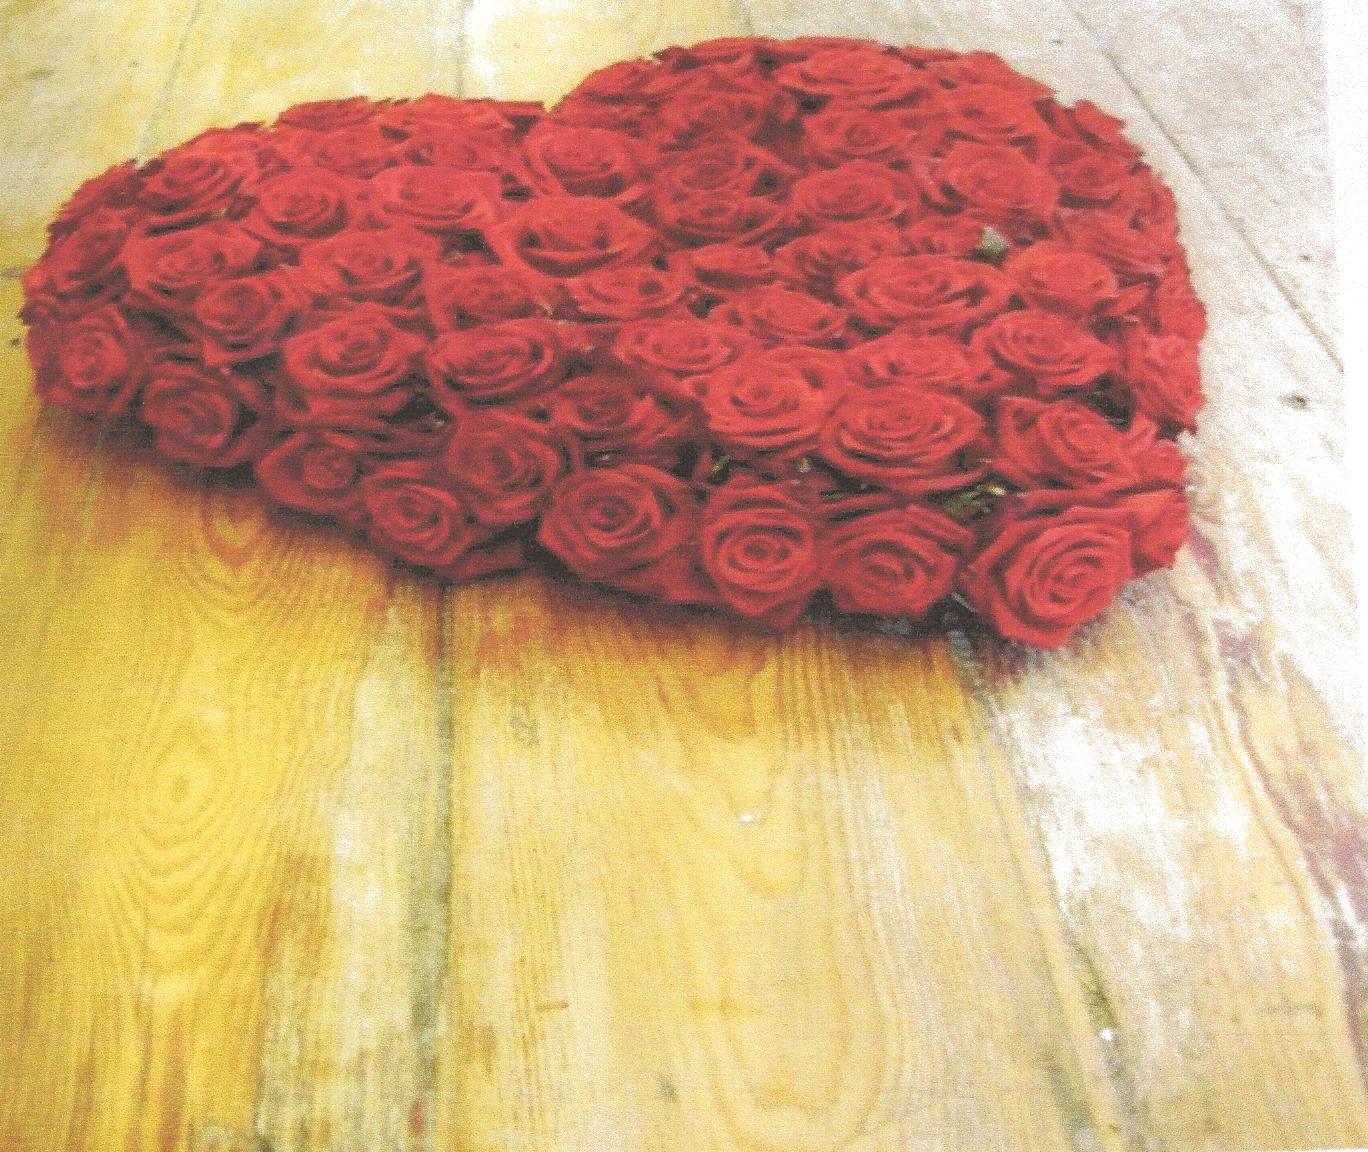 NR 14 Hart volledig rode rozen 150 euro